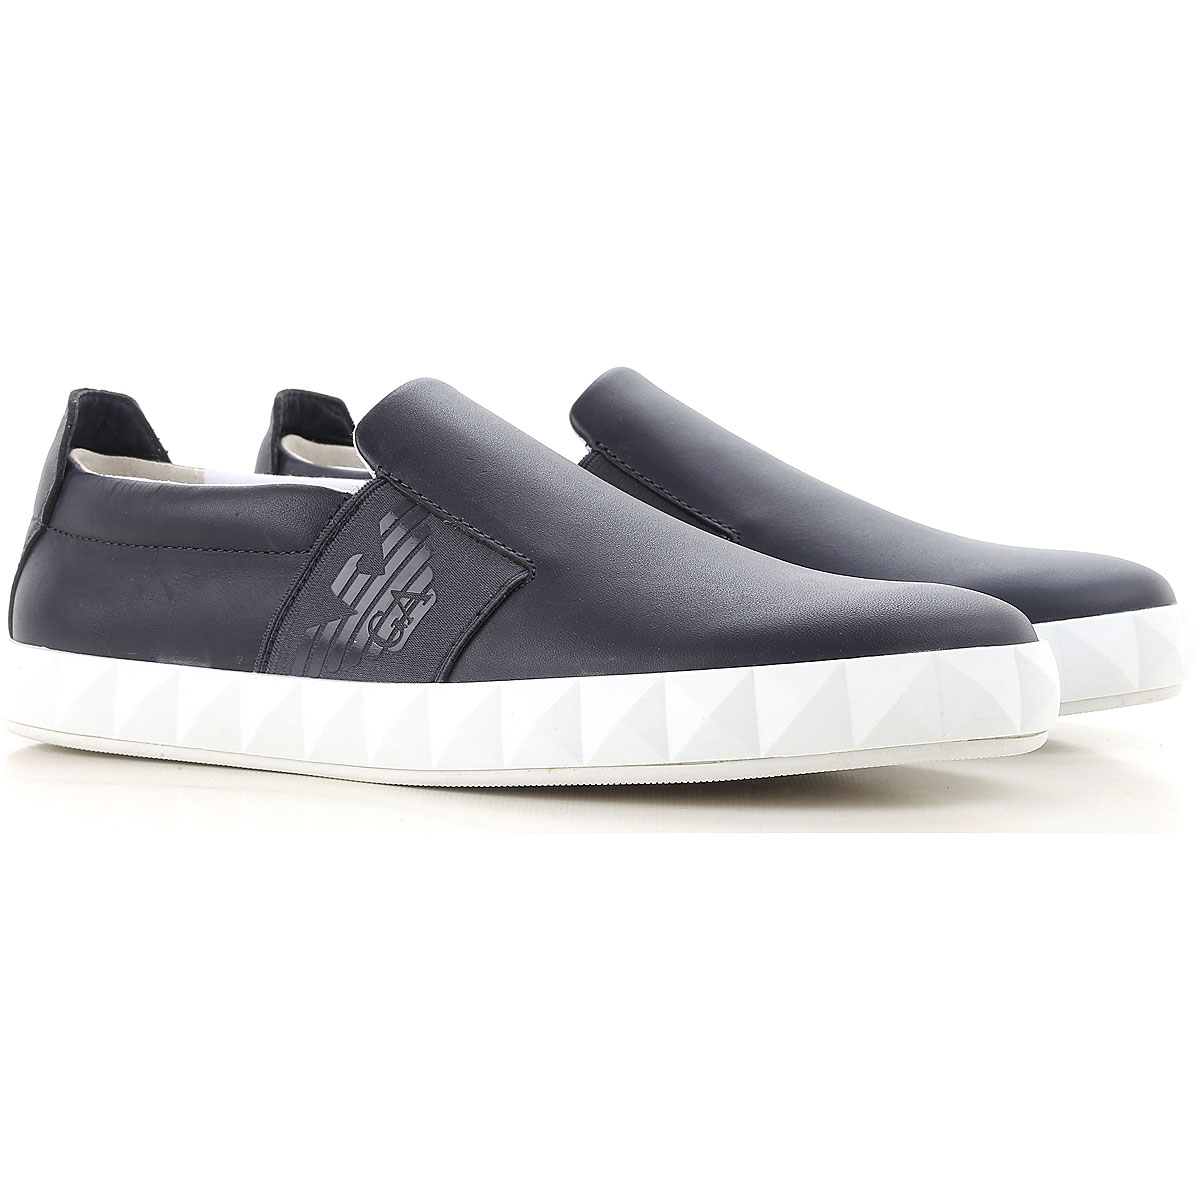 e6a0d92742 Mens Shoes Emporio Armani, Style code: x4x212-xf187-00005